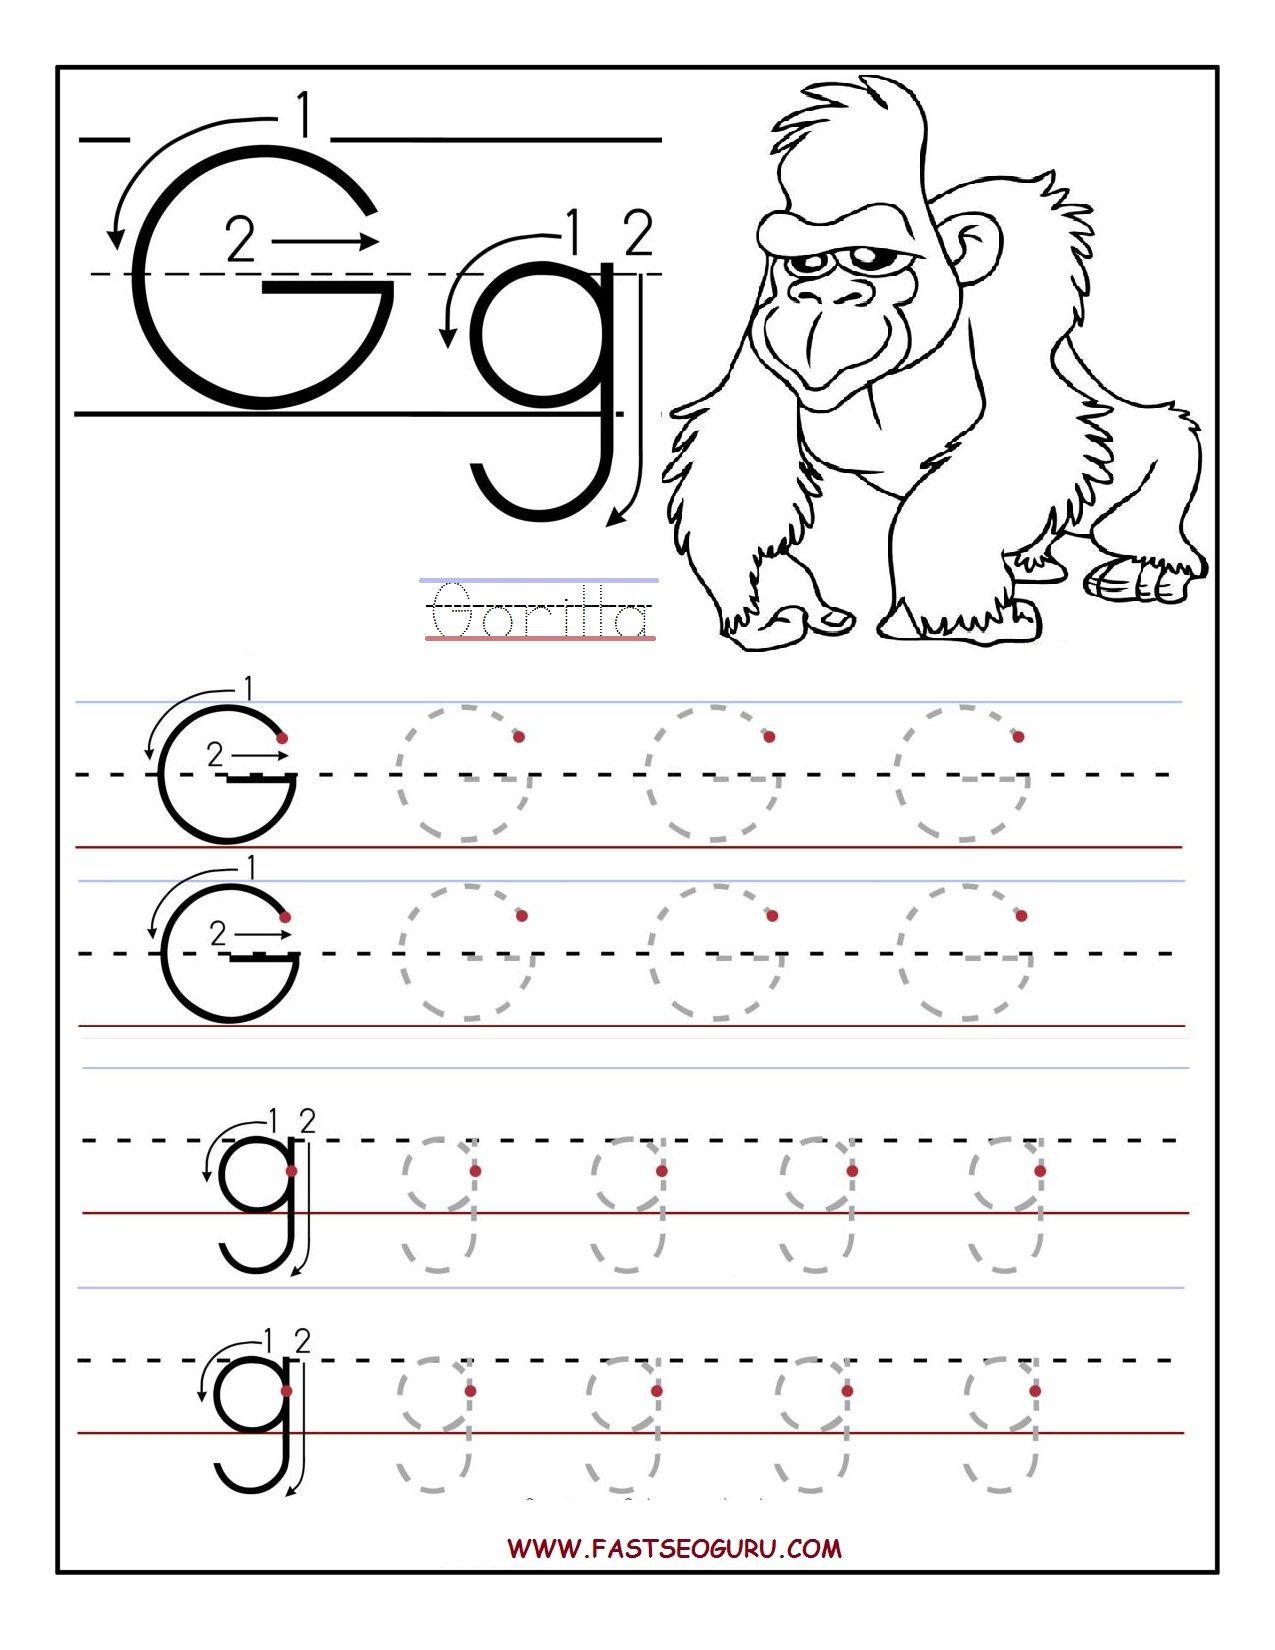 Printable Letter G Tracing Worksheets For Preschool inside G Letter Tracing